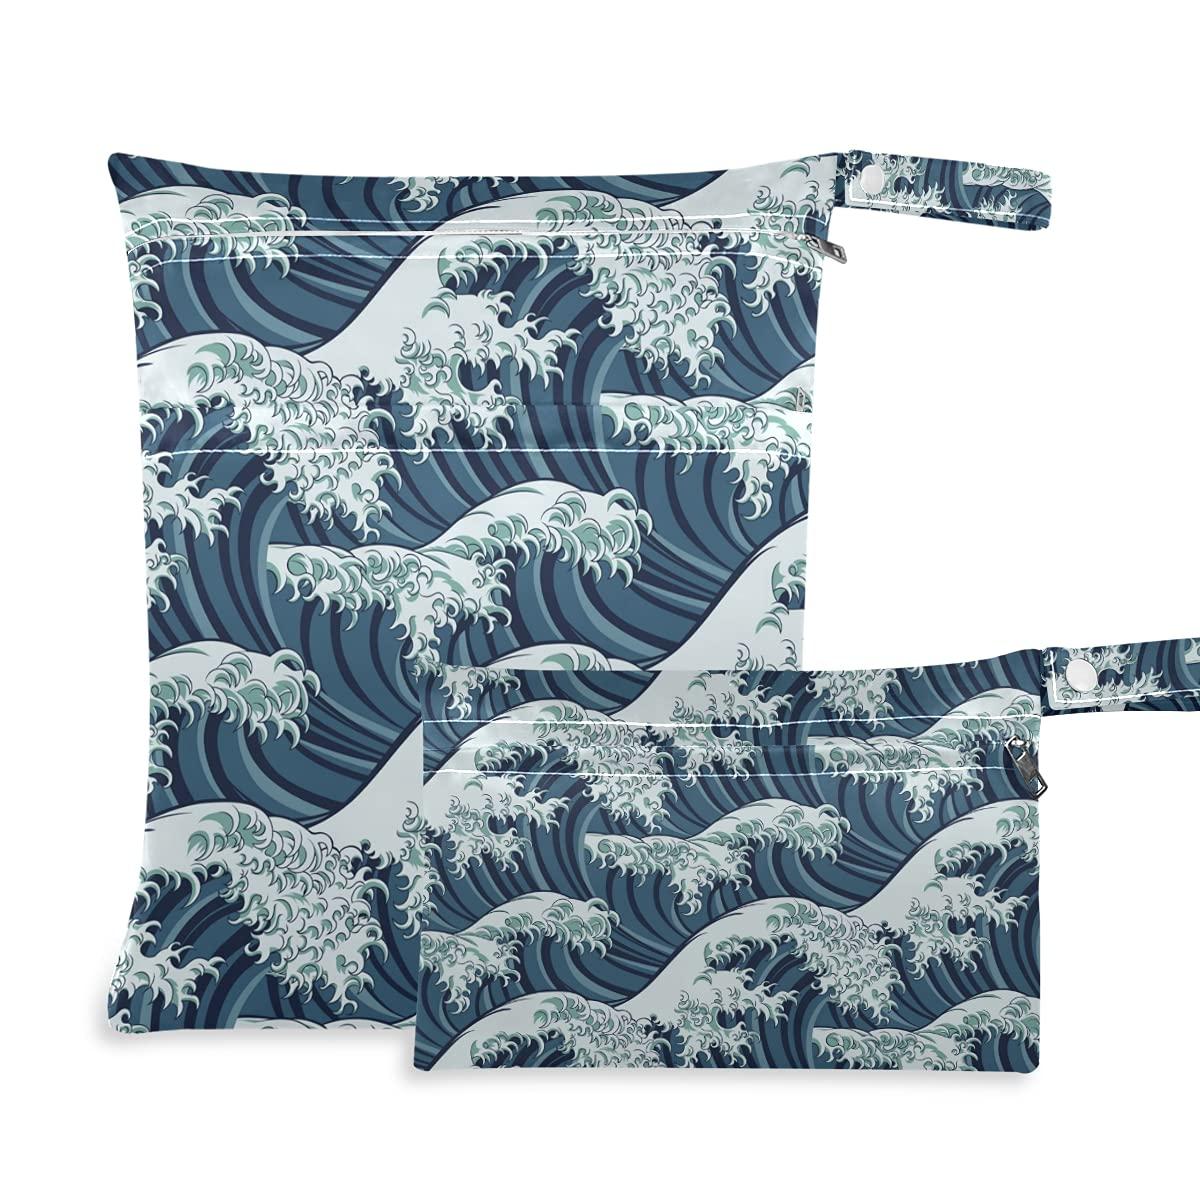 Japanese Great Wave shopping Wet Dry favorite Diaper Reusable Swim Bag for